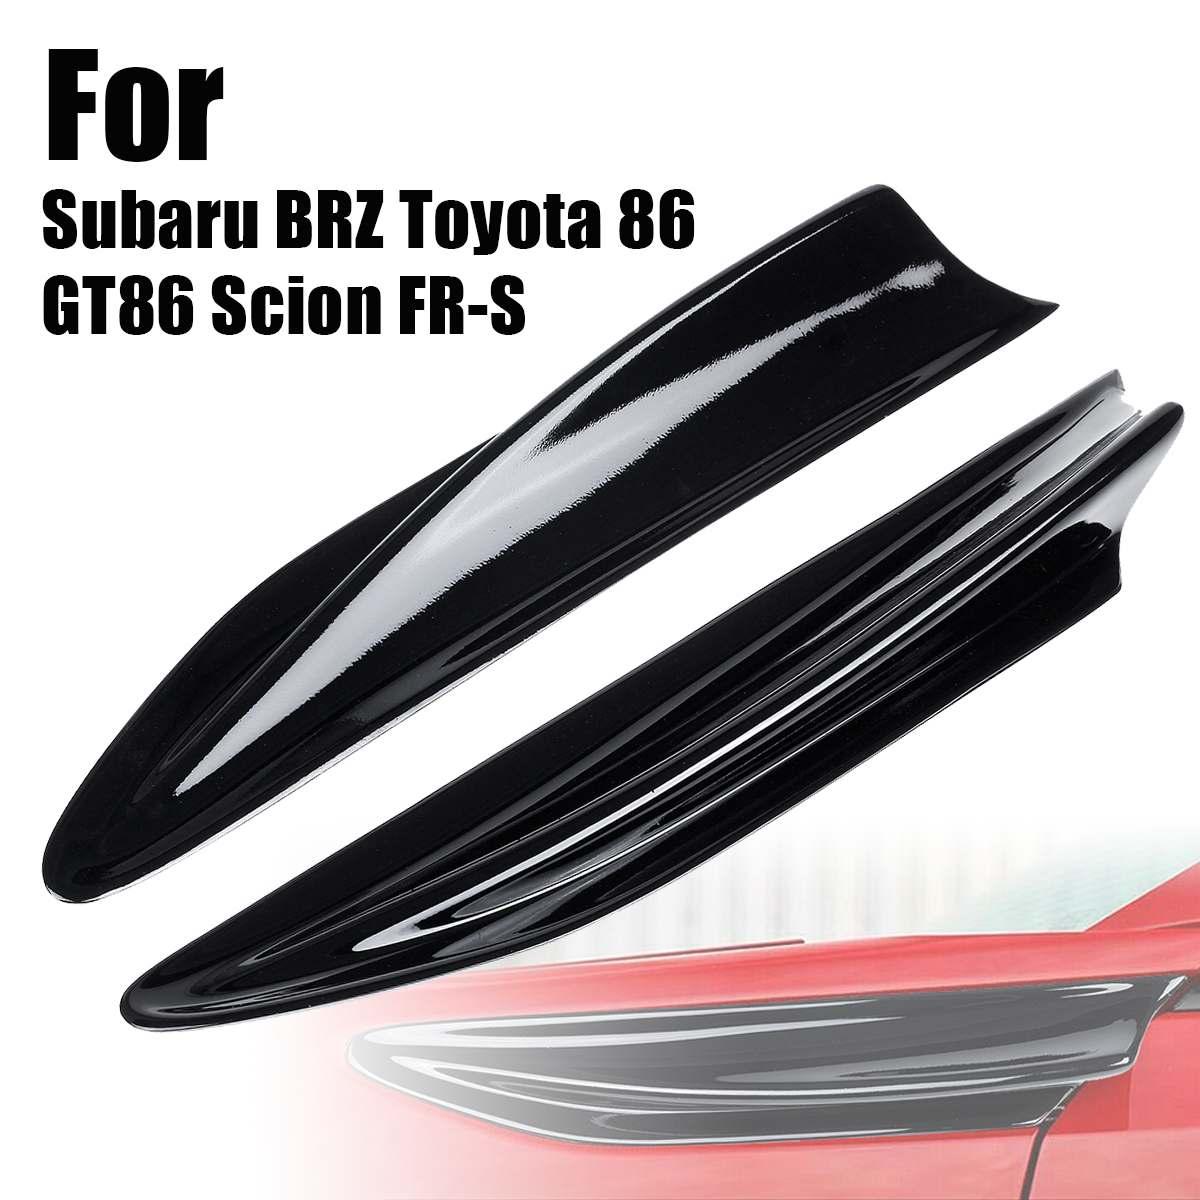 2PCS/Set Carbon Fiber Side Fender Fin Vents For Subaru BRZ for Toyota 86 GT86 Scion FR-S